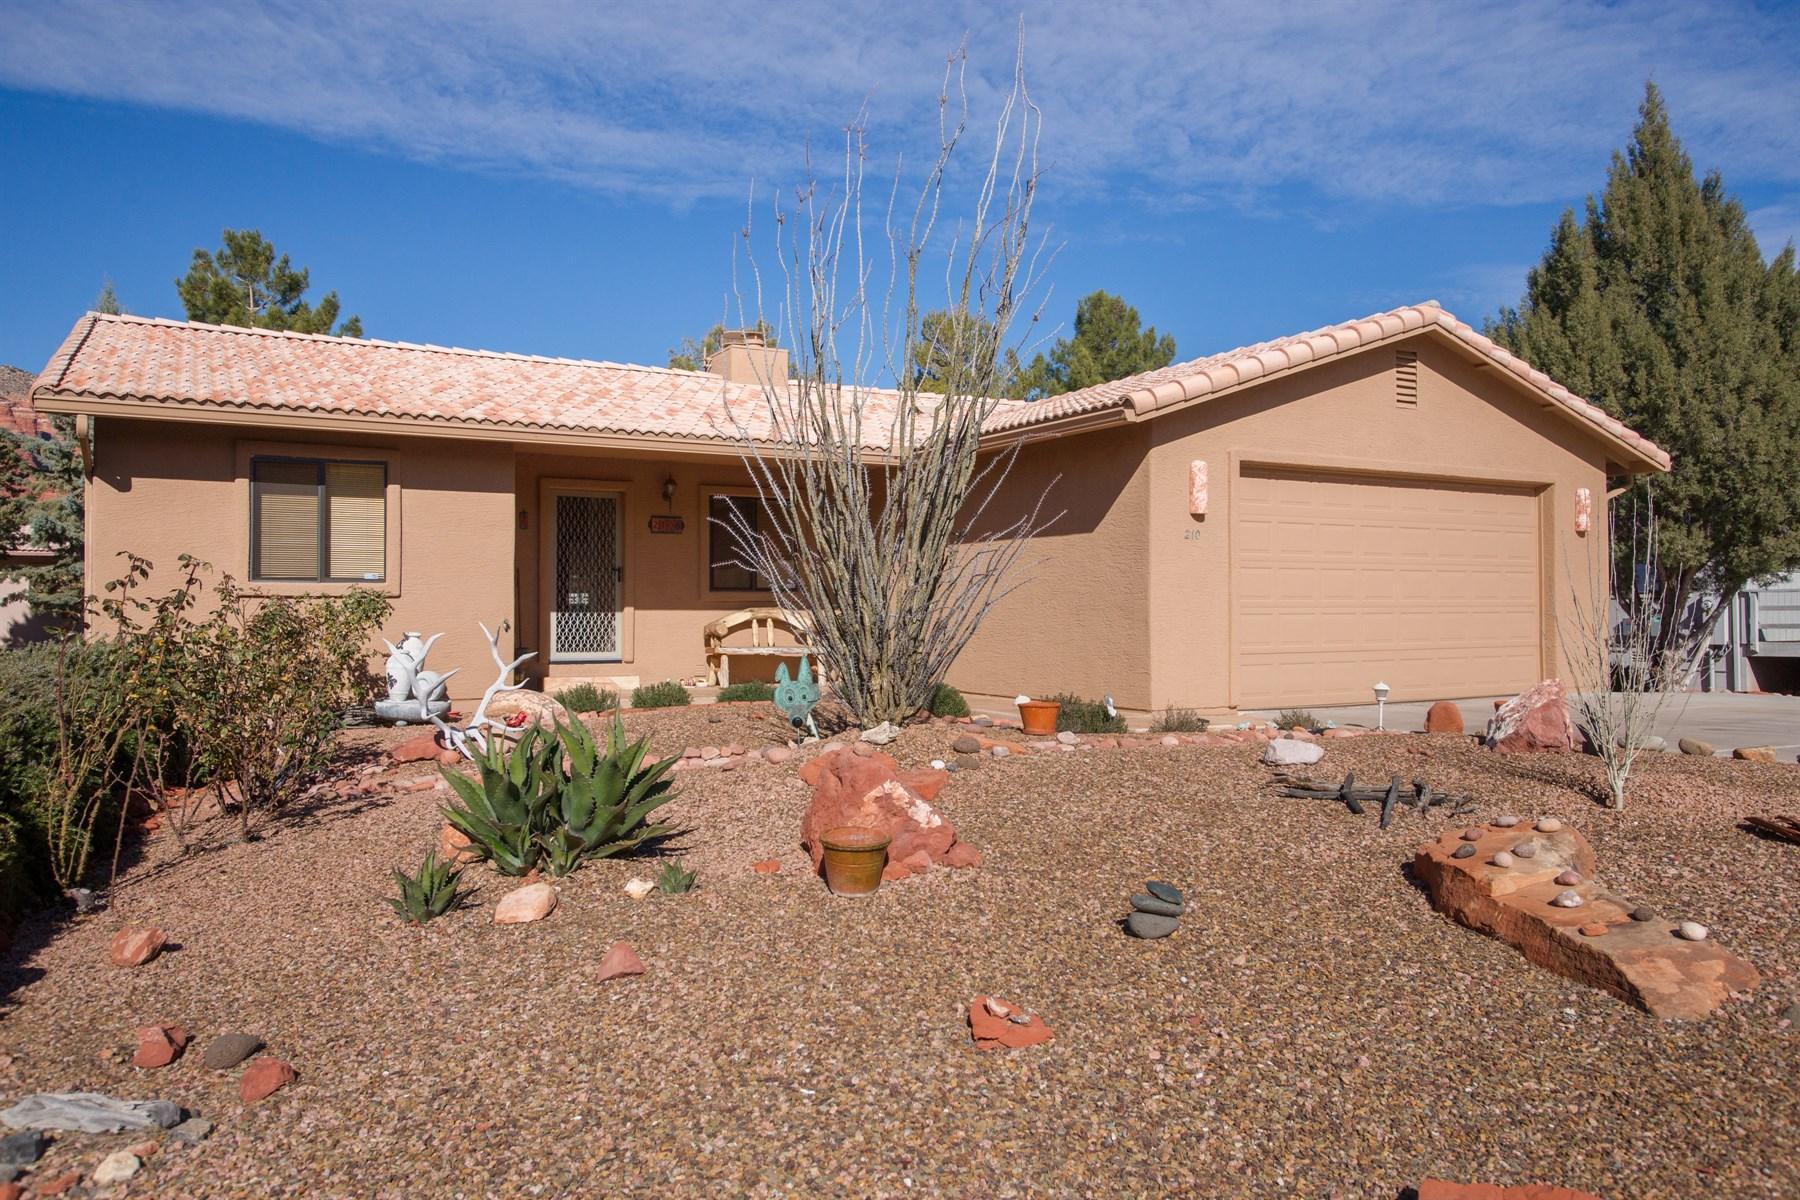 Vivienda unifamiliar por un Venta en Lovely family home in sedona. 210 Concho Drive Sedona, Arizona 86351 Estados Unidos